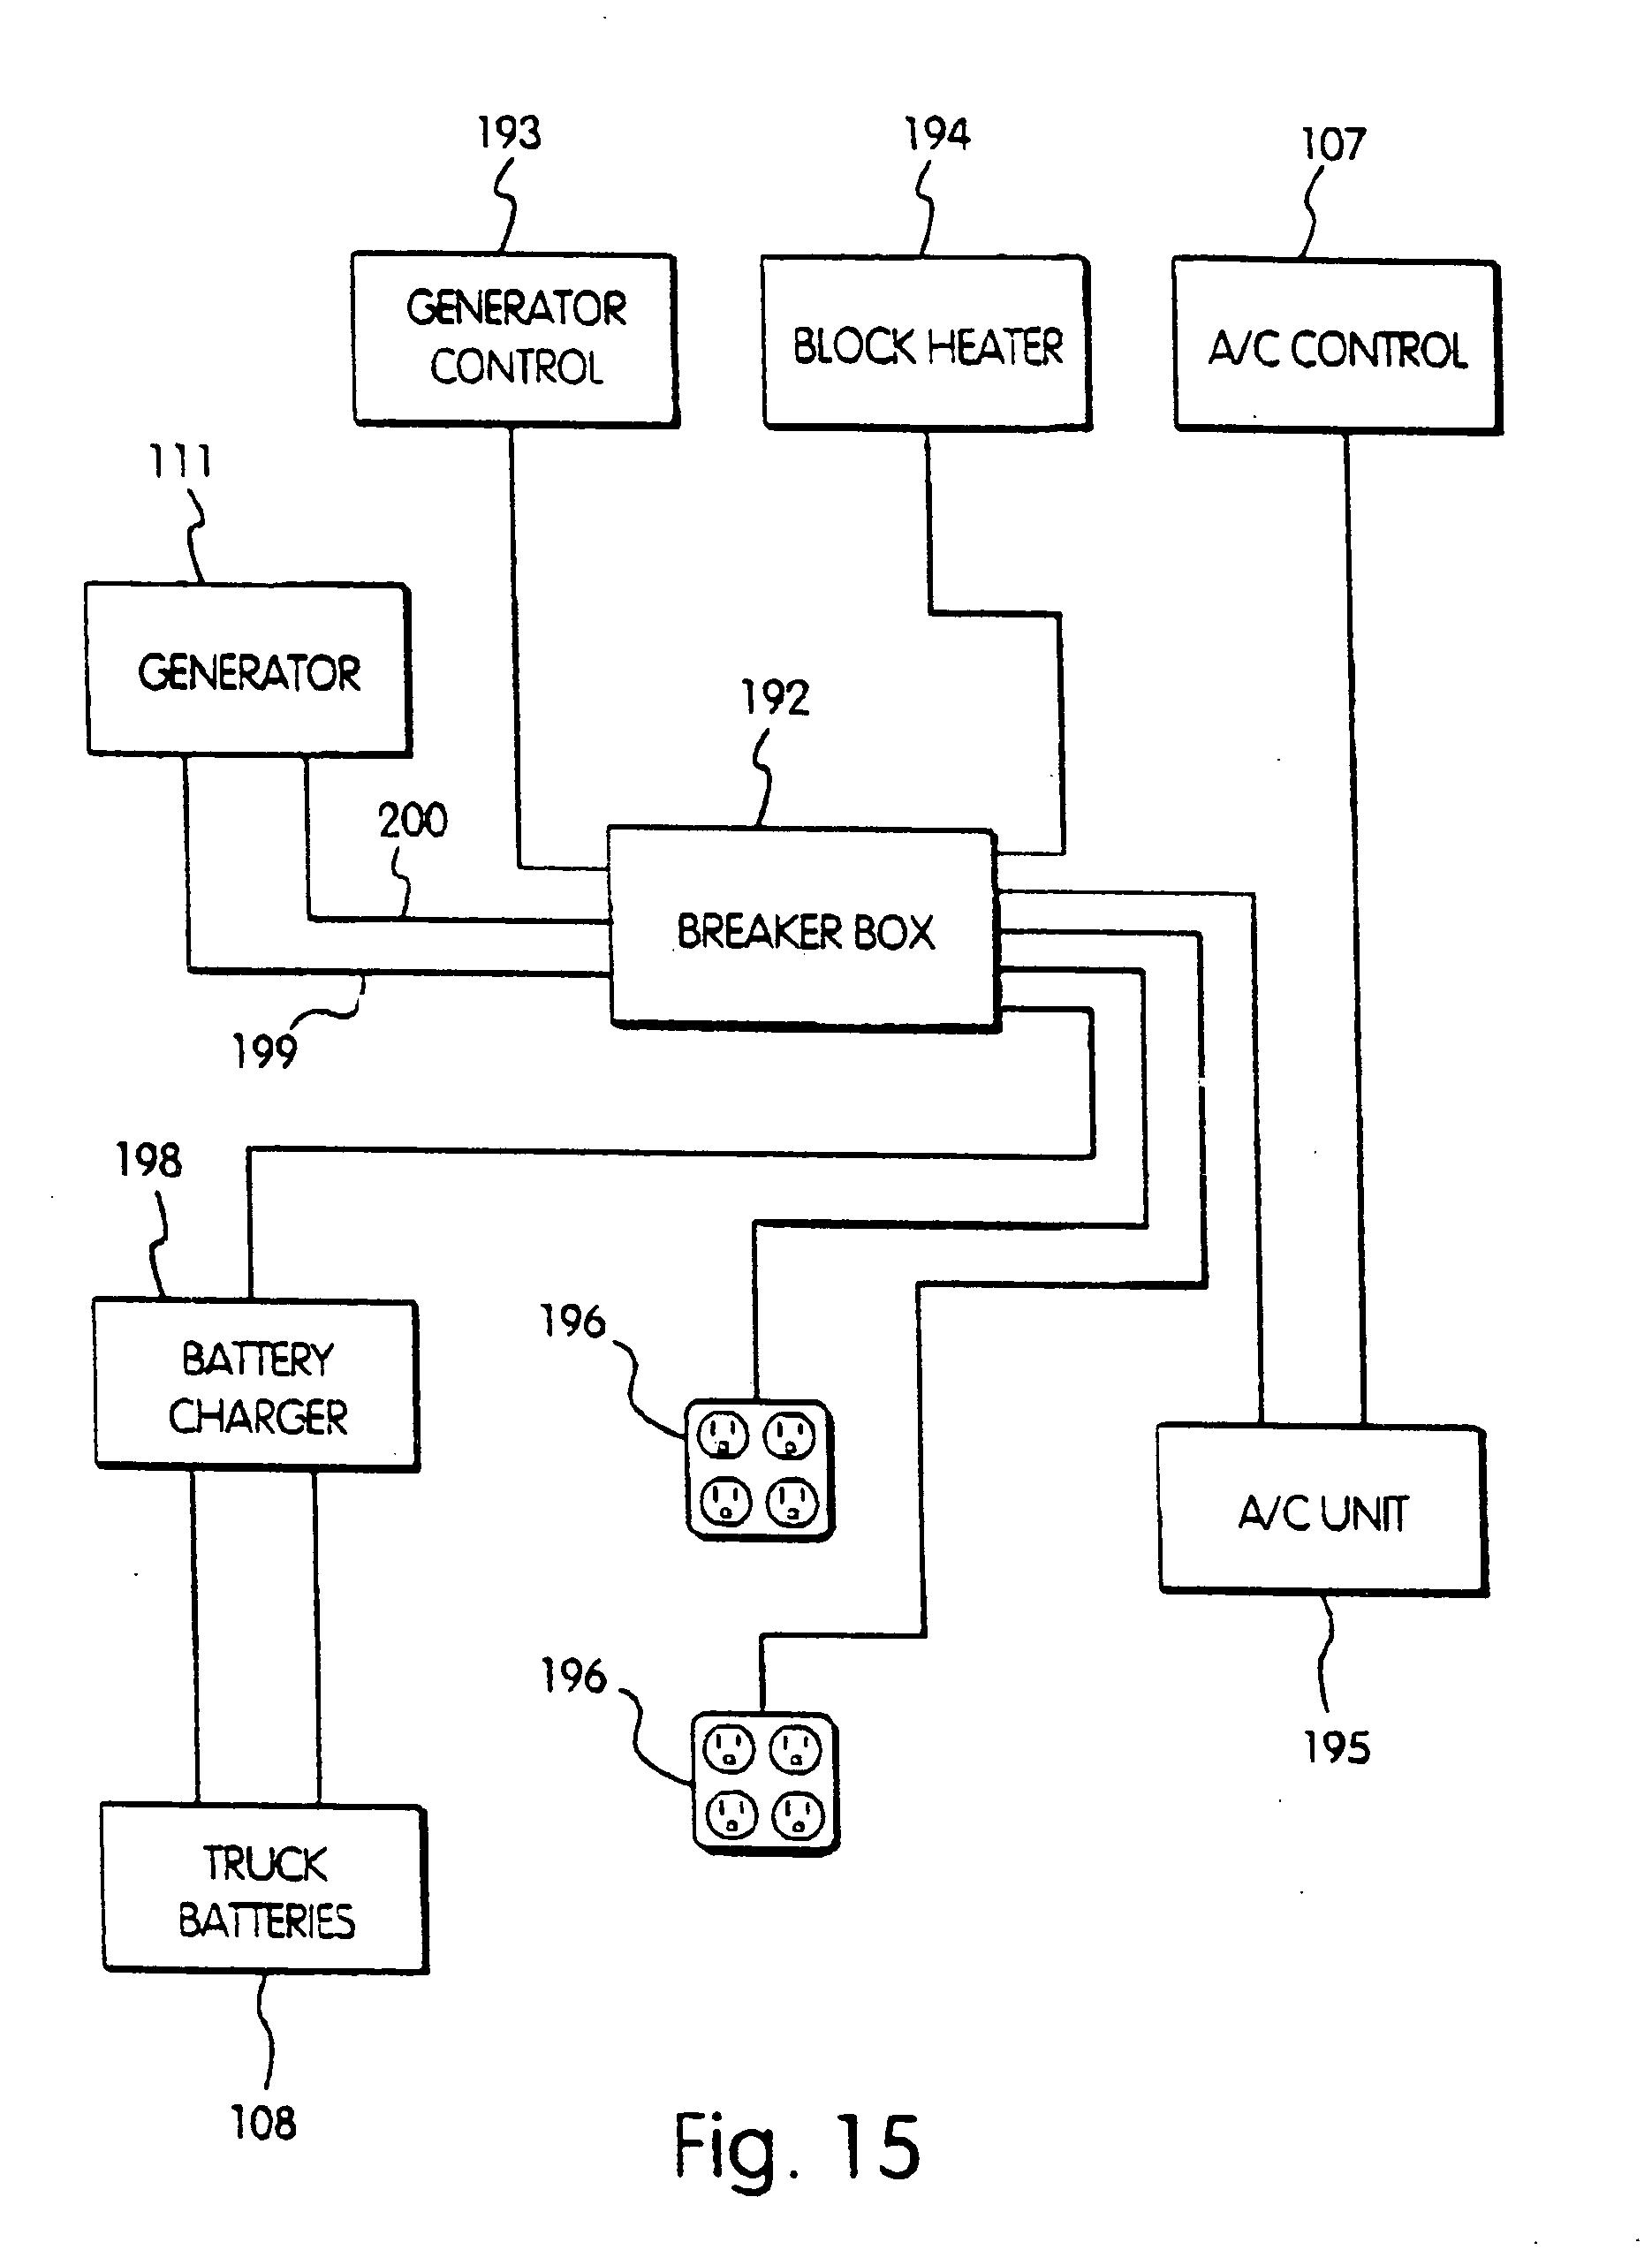 Lt1 Conversion Wiring Diagram Jaguar Worksheet And 1996 Engine Electrical Diagrams Rh Wiringforall Today 1995 Swap 1994